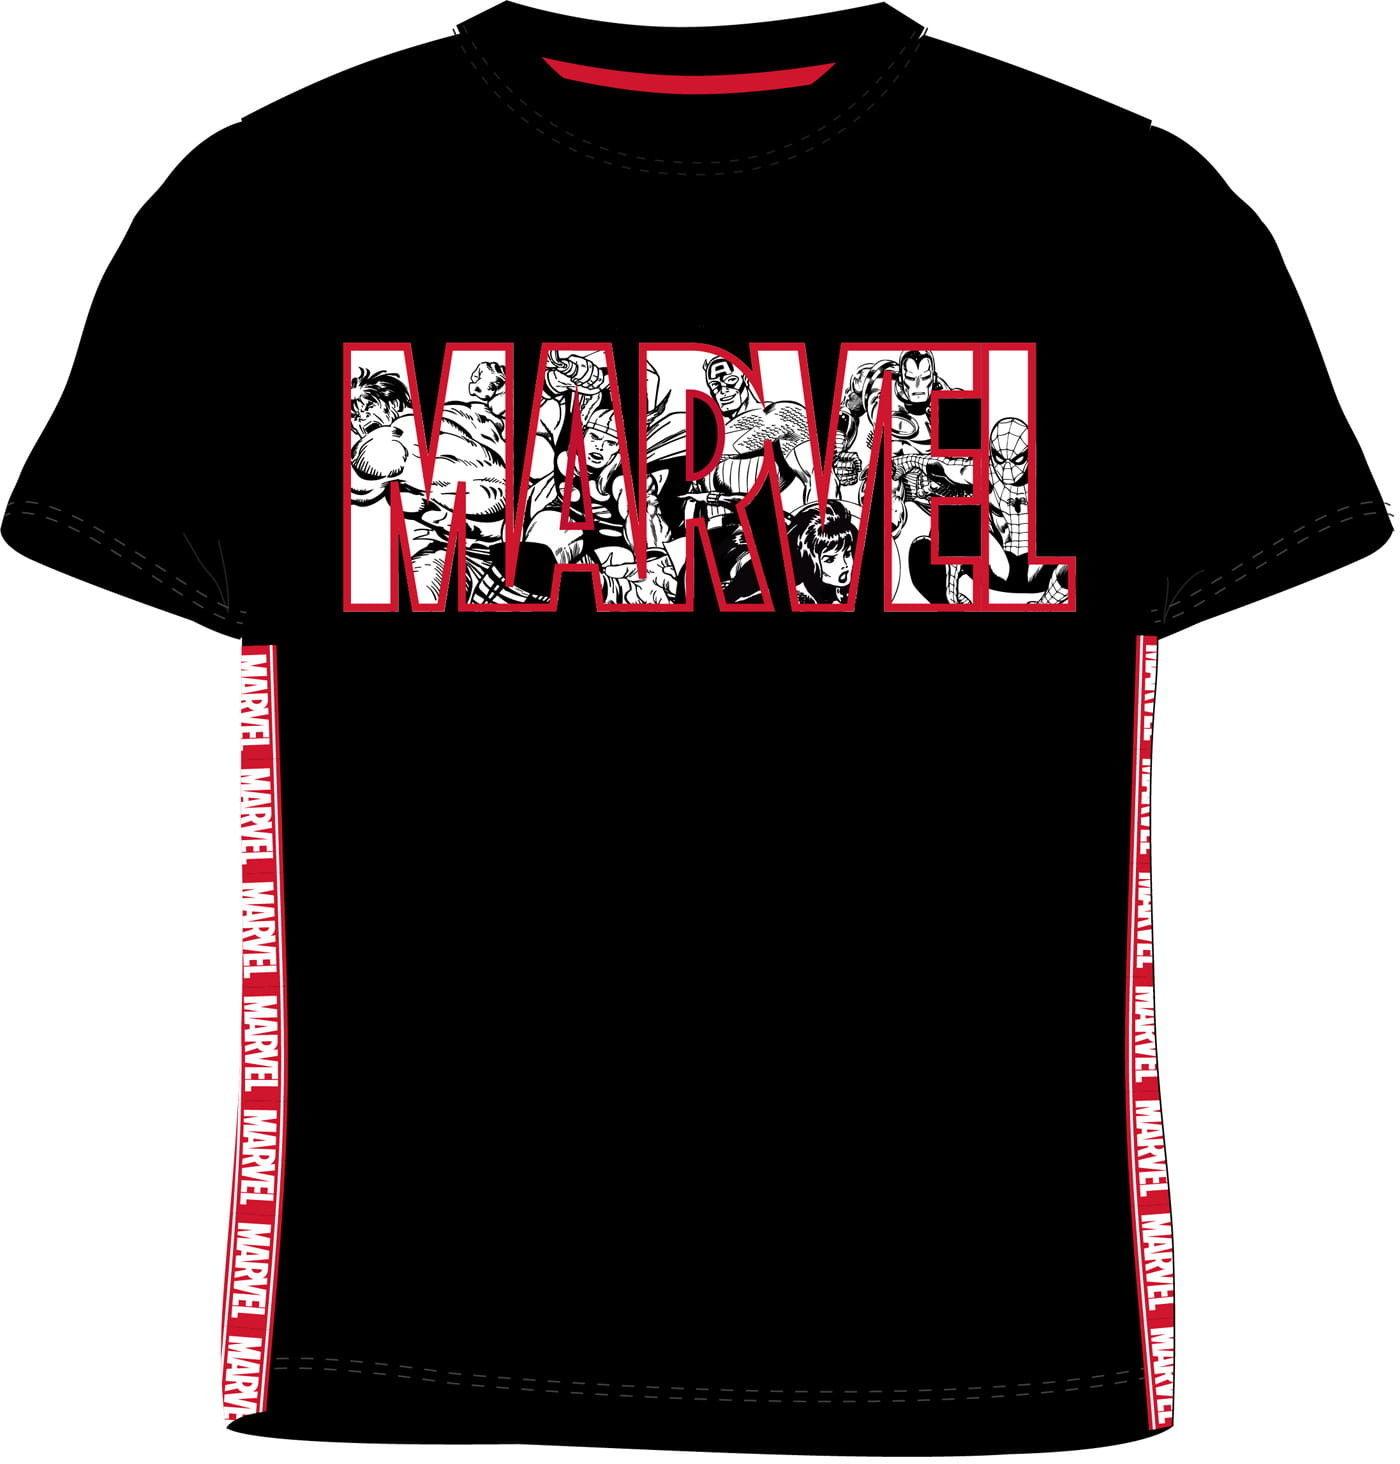 Bluzka chłopięca AVENGERS - Marvel